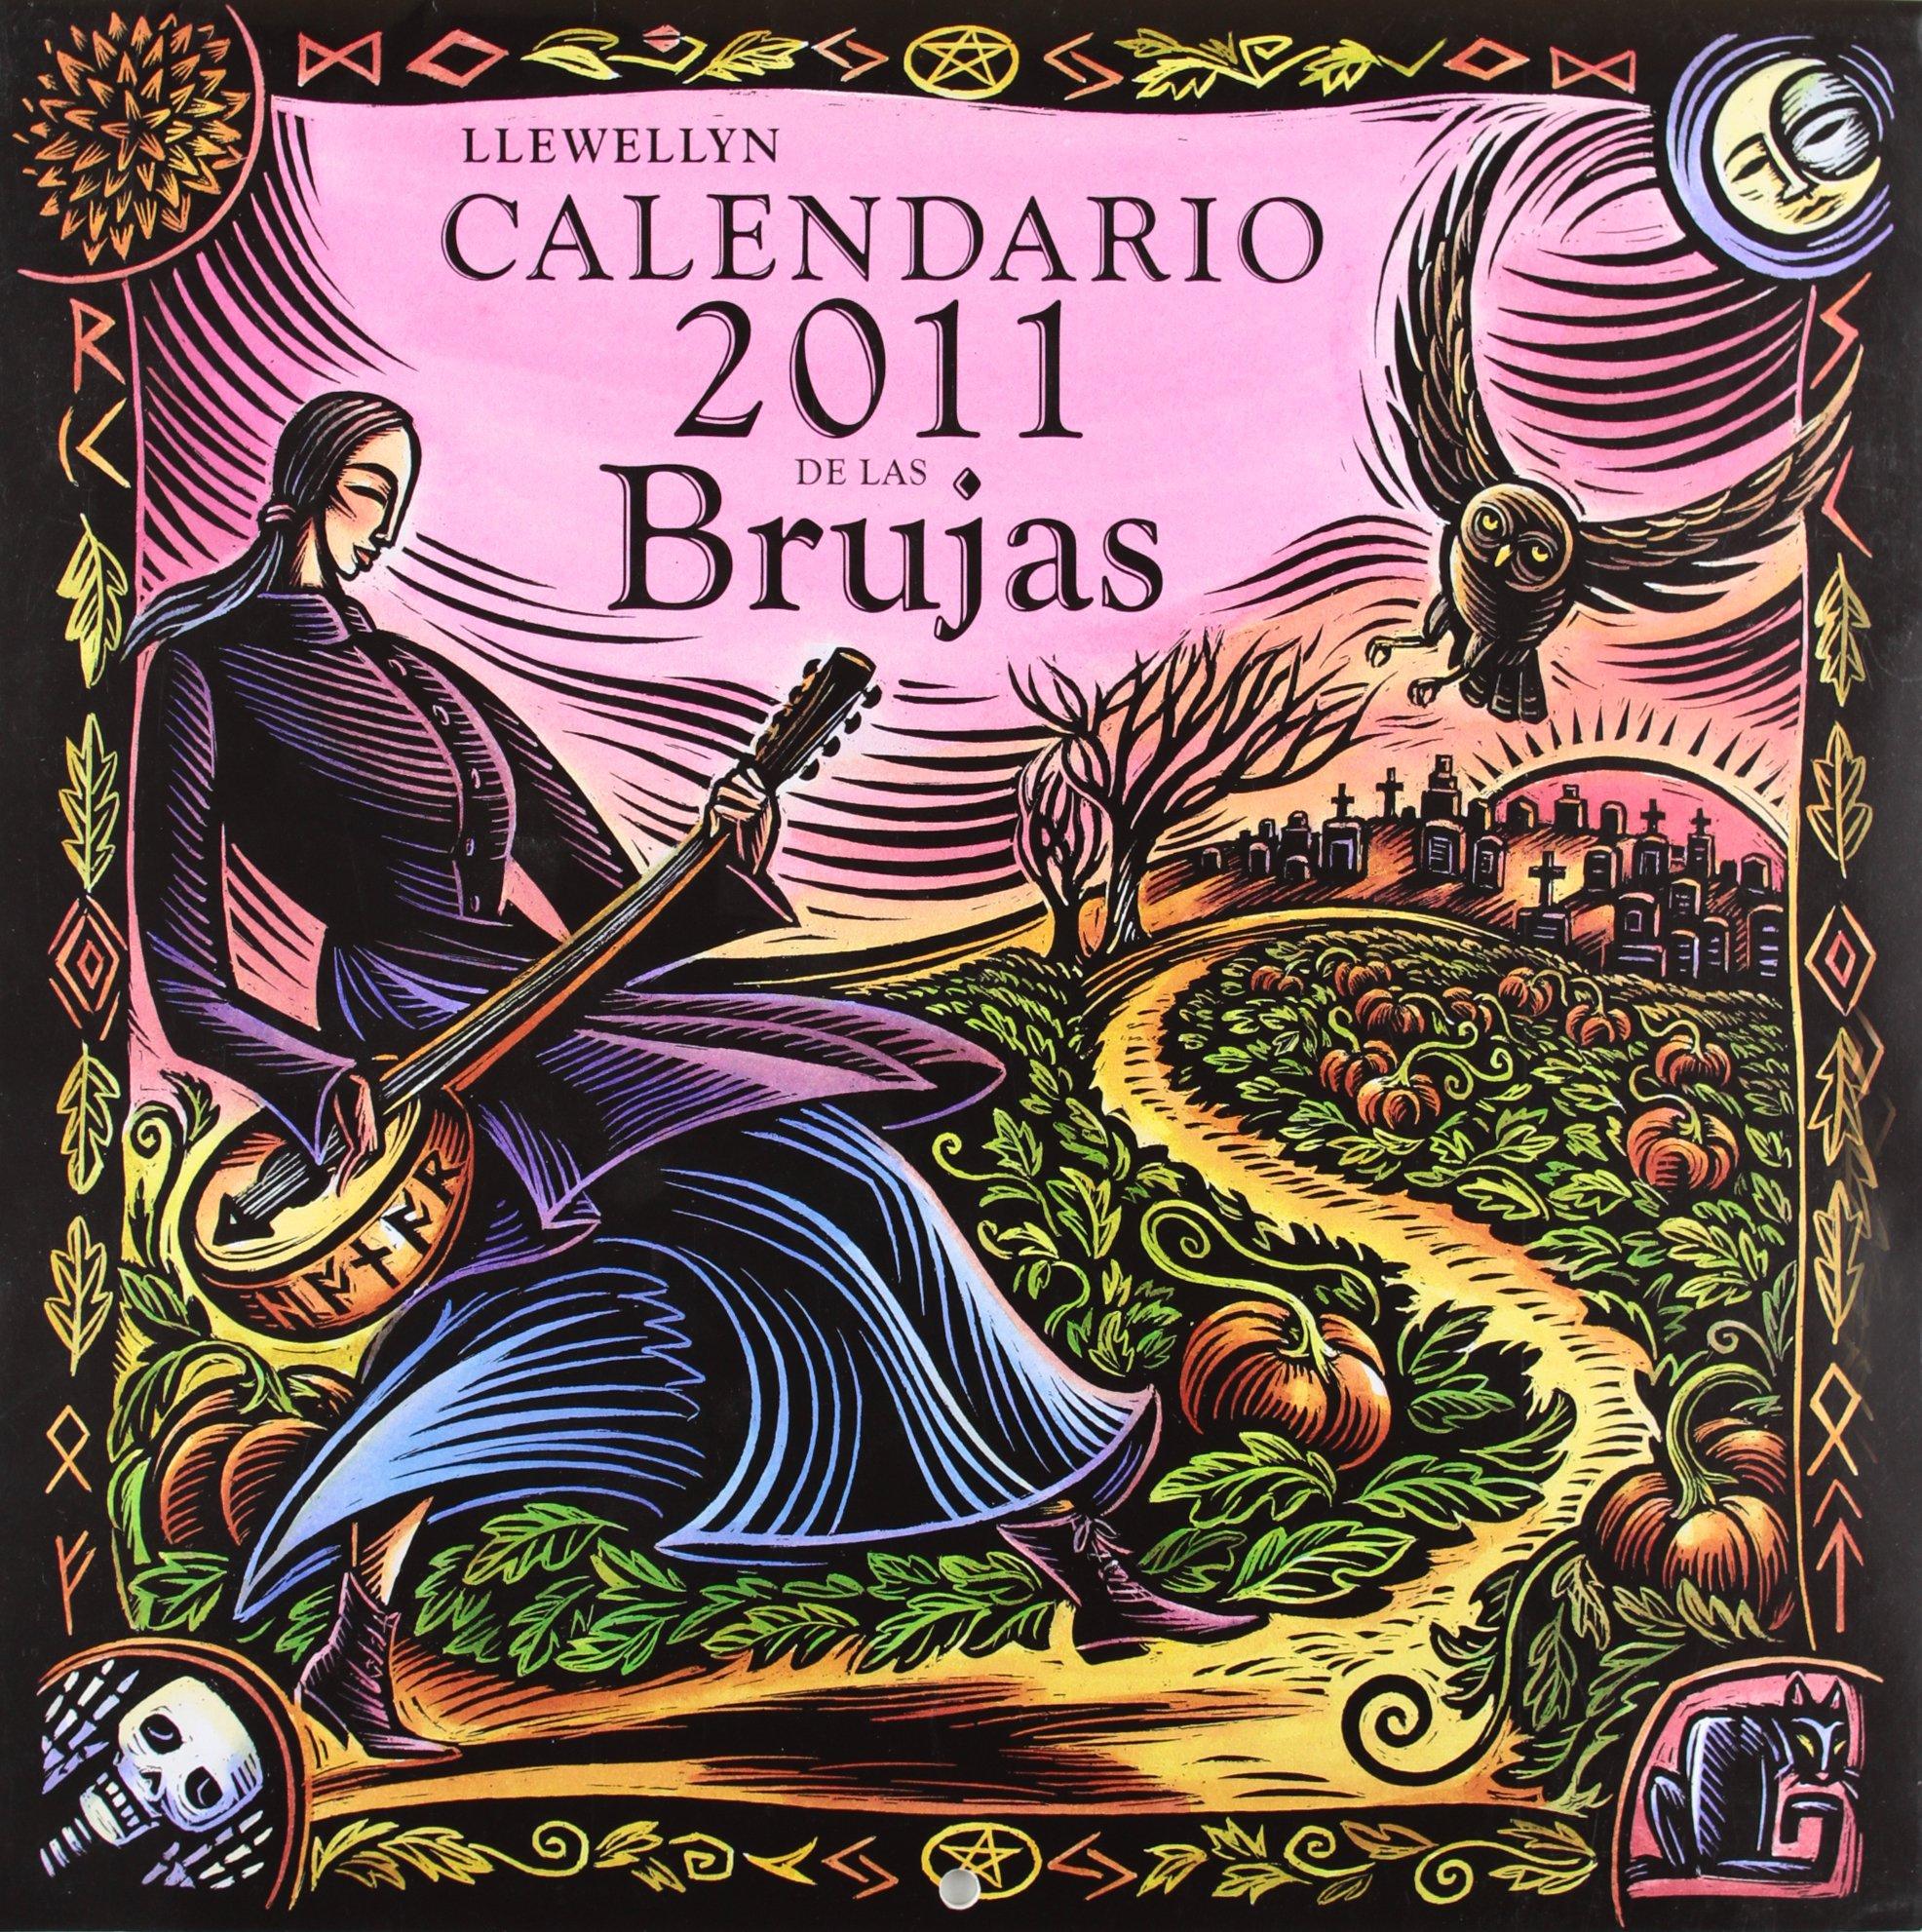 Calendario 2011 de las brujas (Spanish Edition) (Spanish) Paperback – Wall Calendar, December 15, 2010